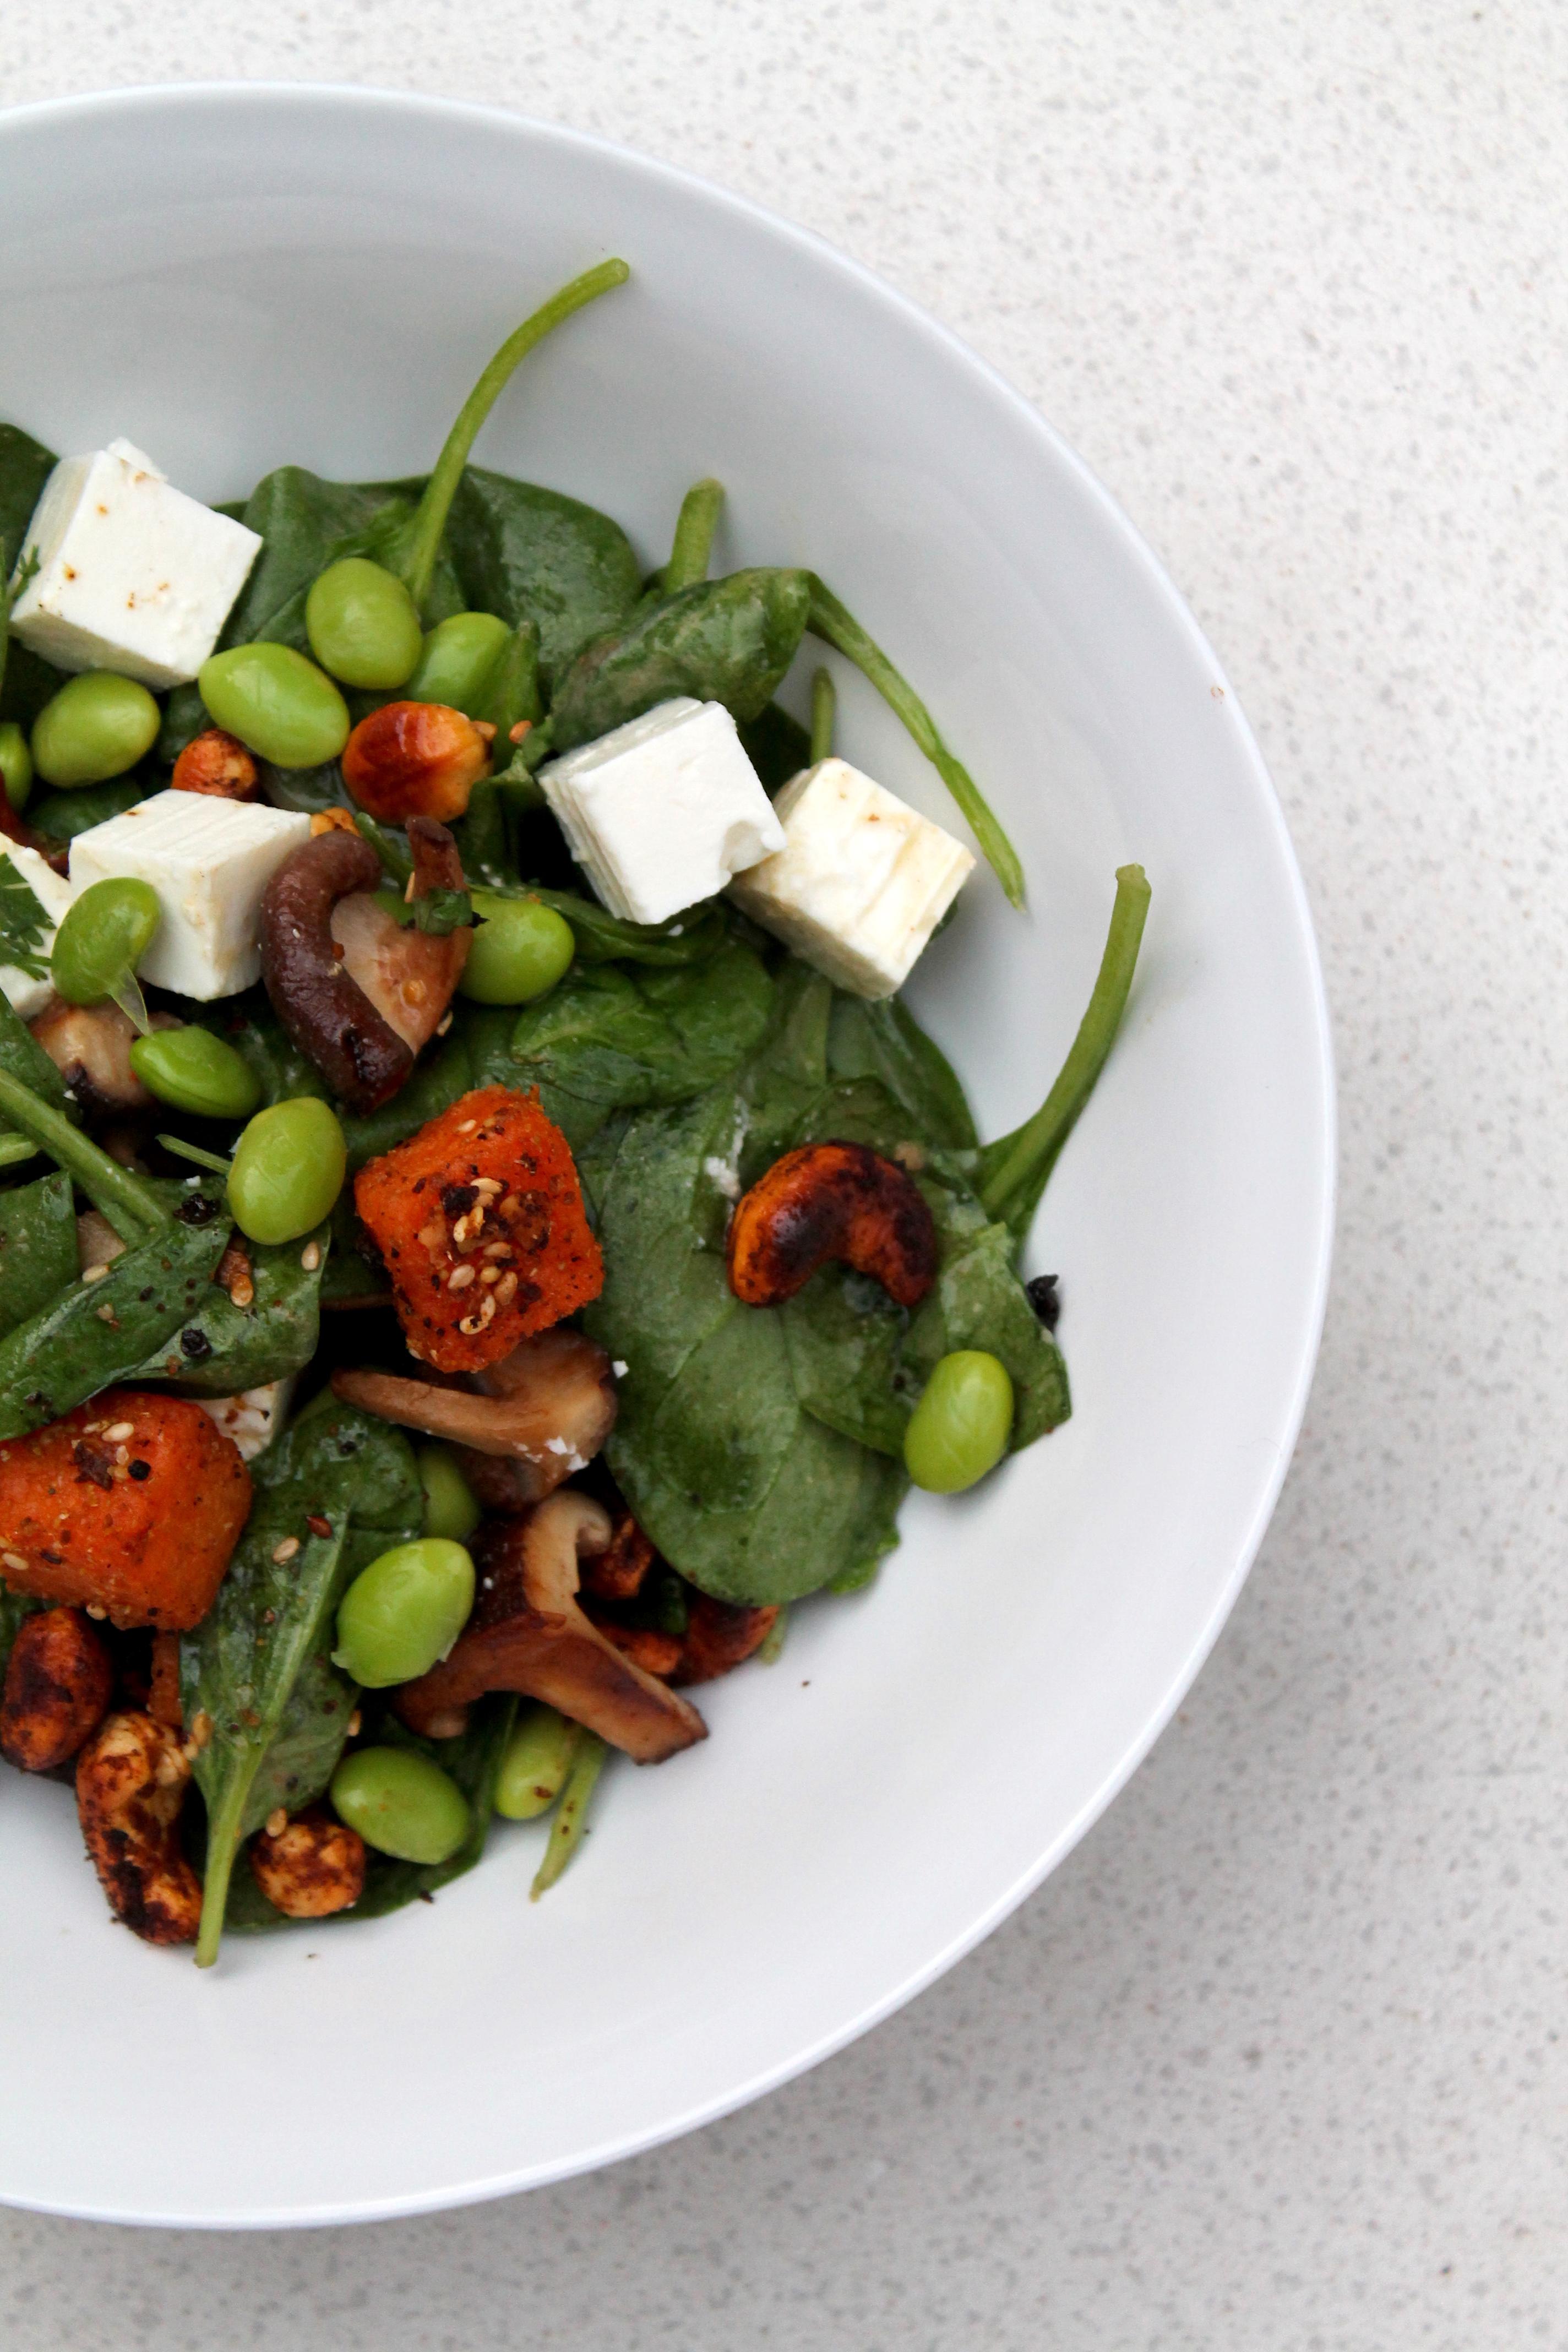 Spinatsalat mit Süßkartoffeln und Tahini-Dressing